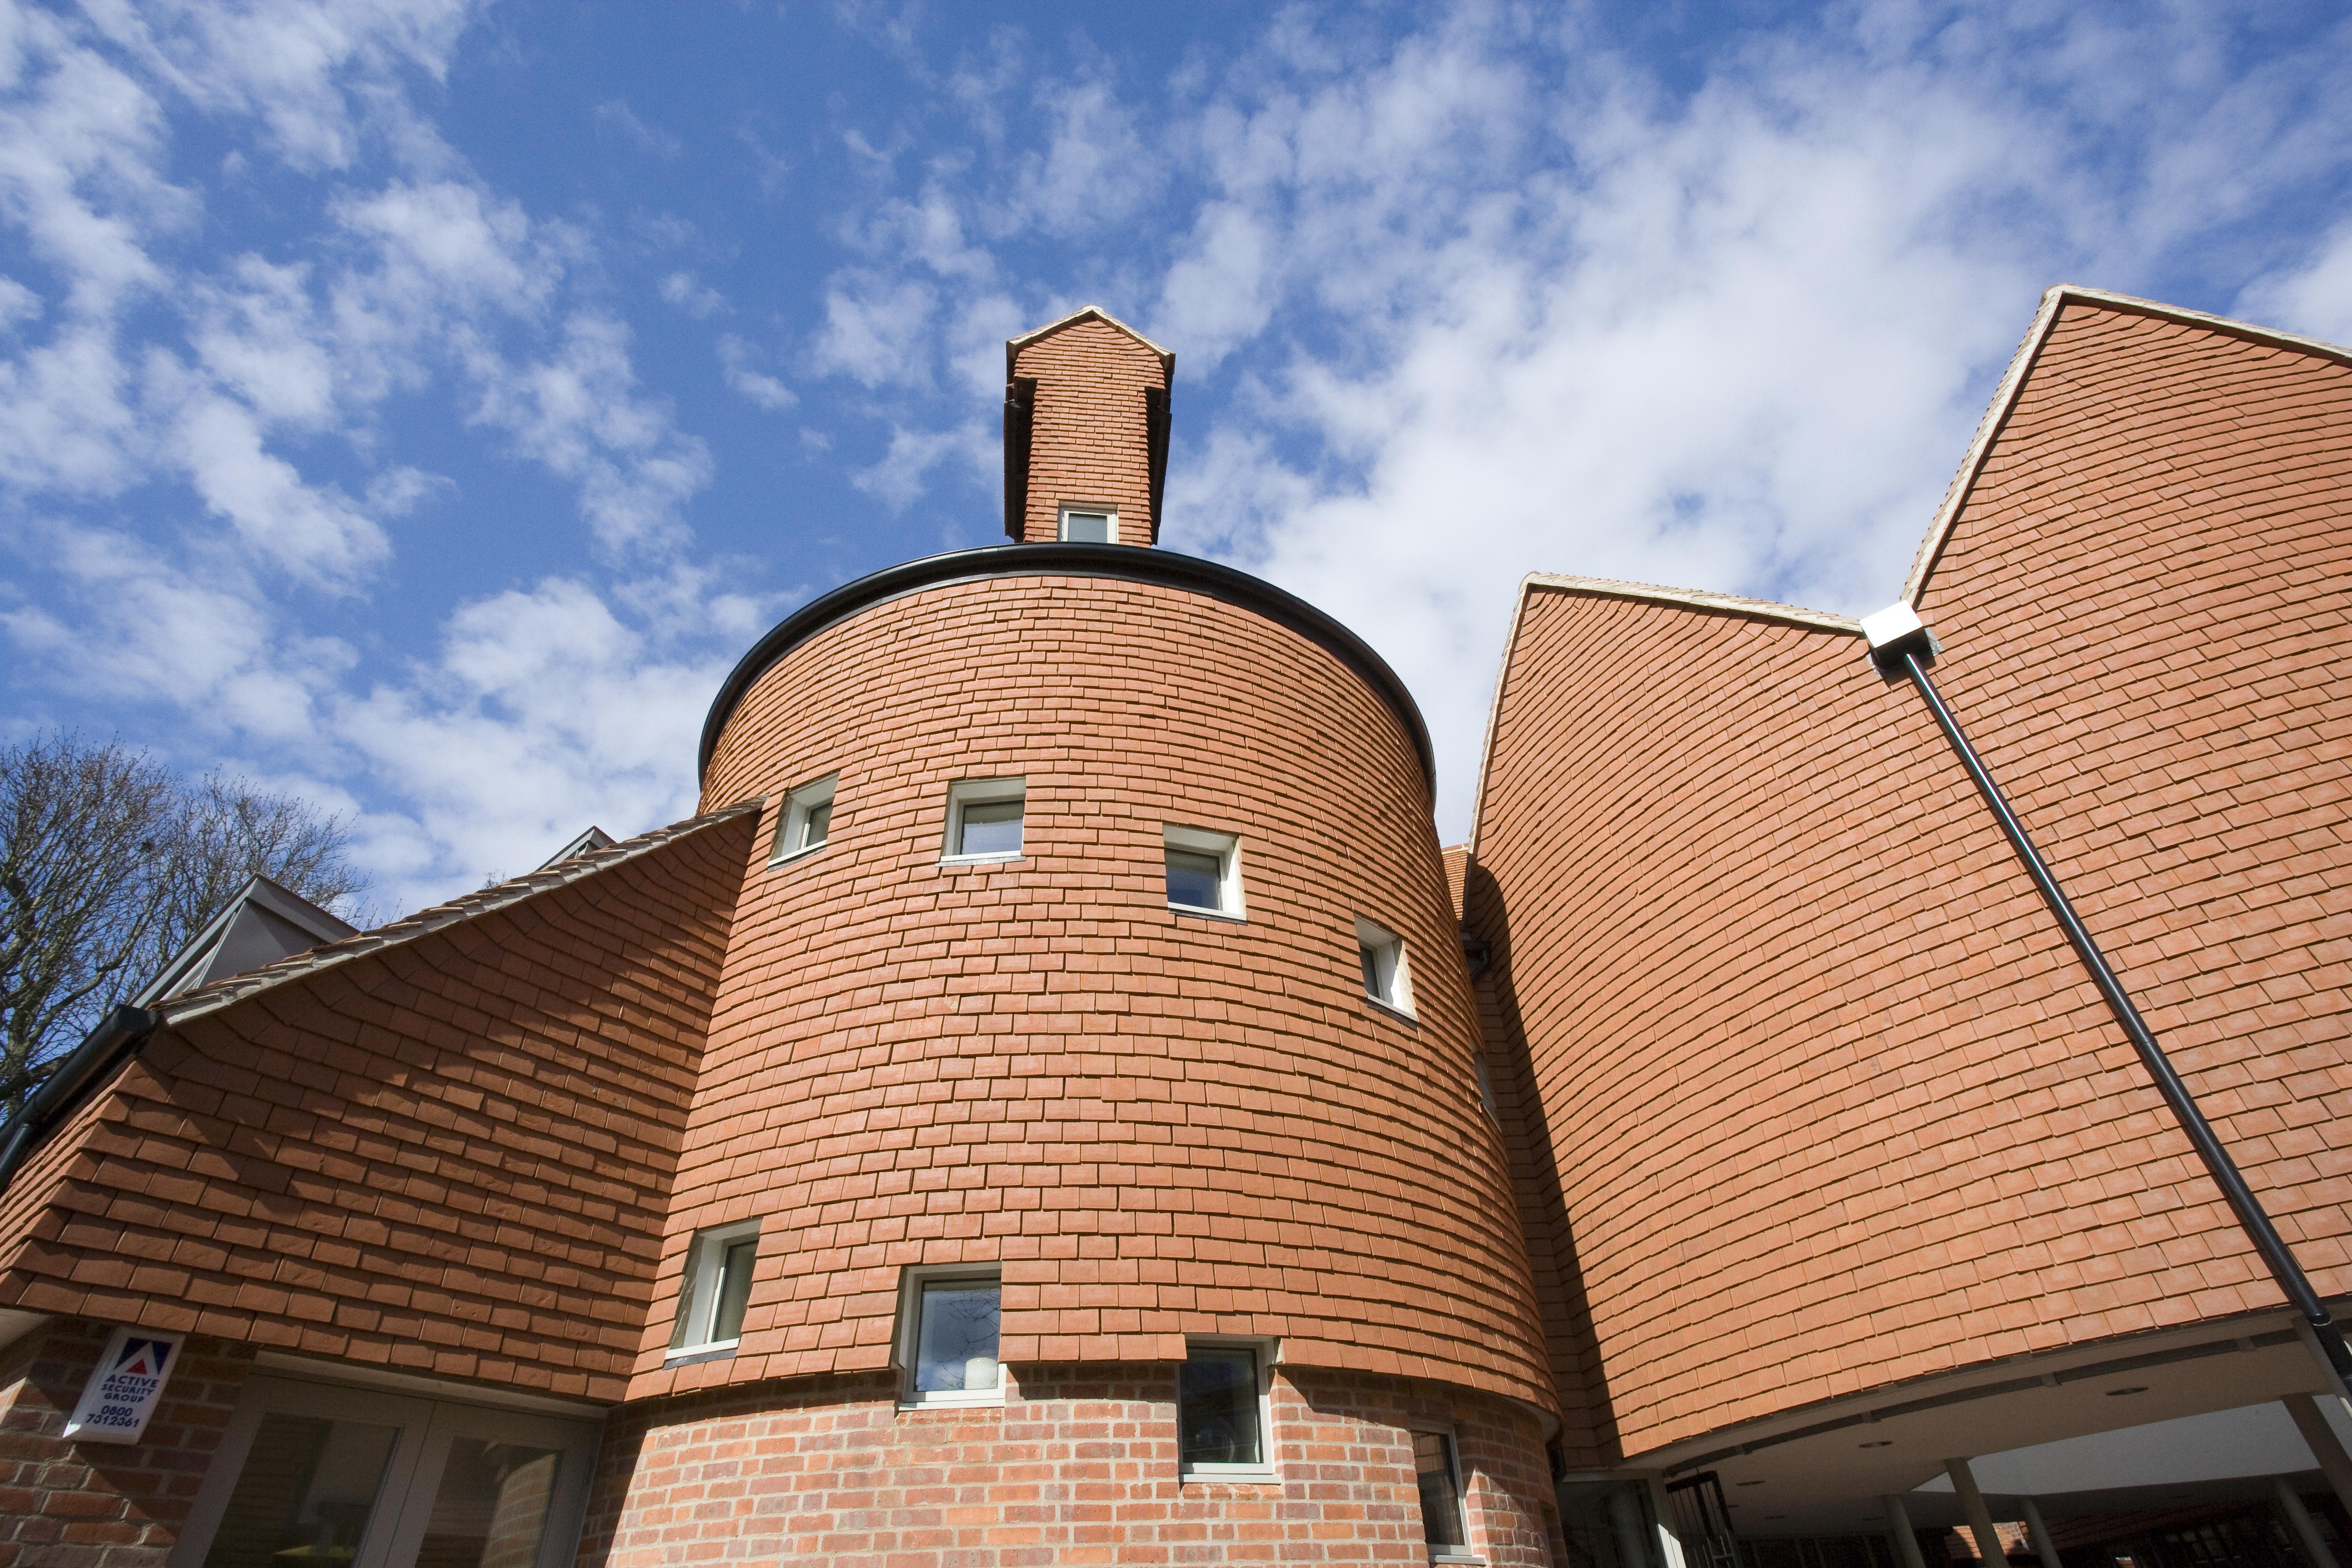 Vertical Tiling of Circular Tower